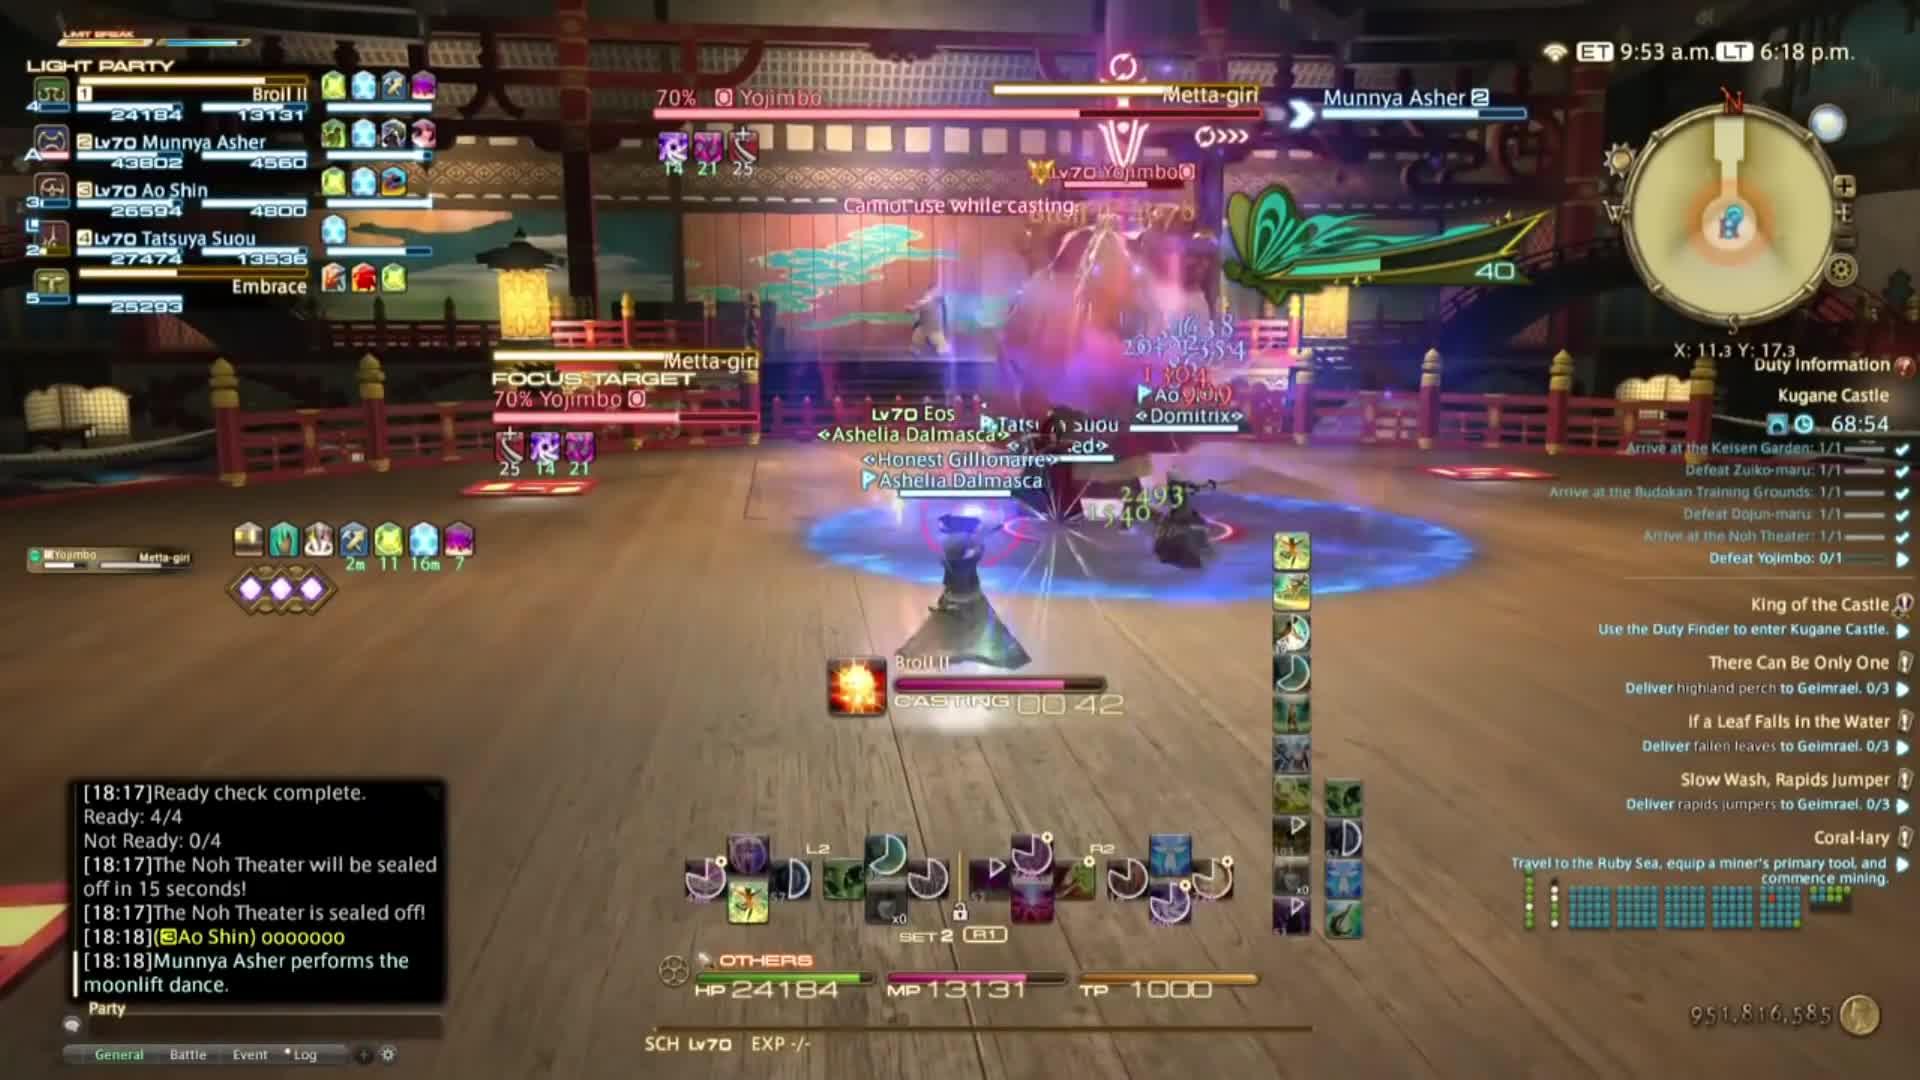 4.0, ENIX, Excalibur, FFXIV, Fantasy, Final, Game, Guide, II, IX, MMO, MMORPG, PLaythrough, Perfect, SQUARE, Stormblood, Walkthrough, XIV:, boss, yojimbo, Final Fantasy XIV: Stormblood - FFX Yojimbo BOSS Fight!! GIFs